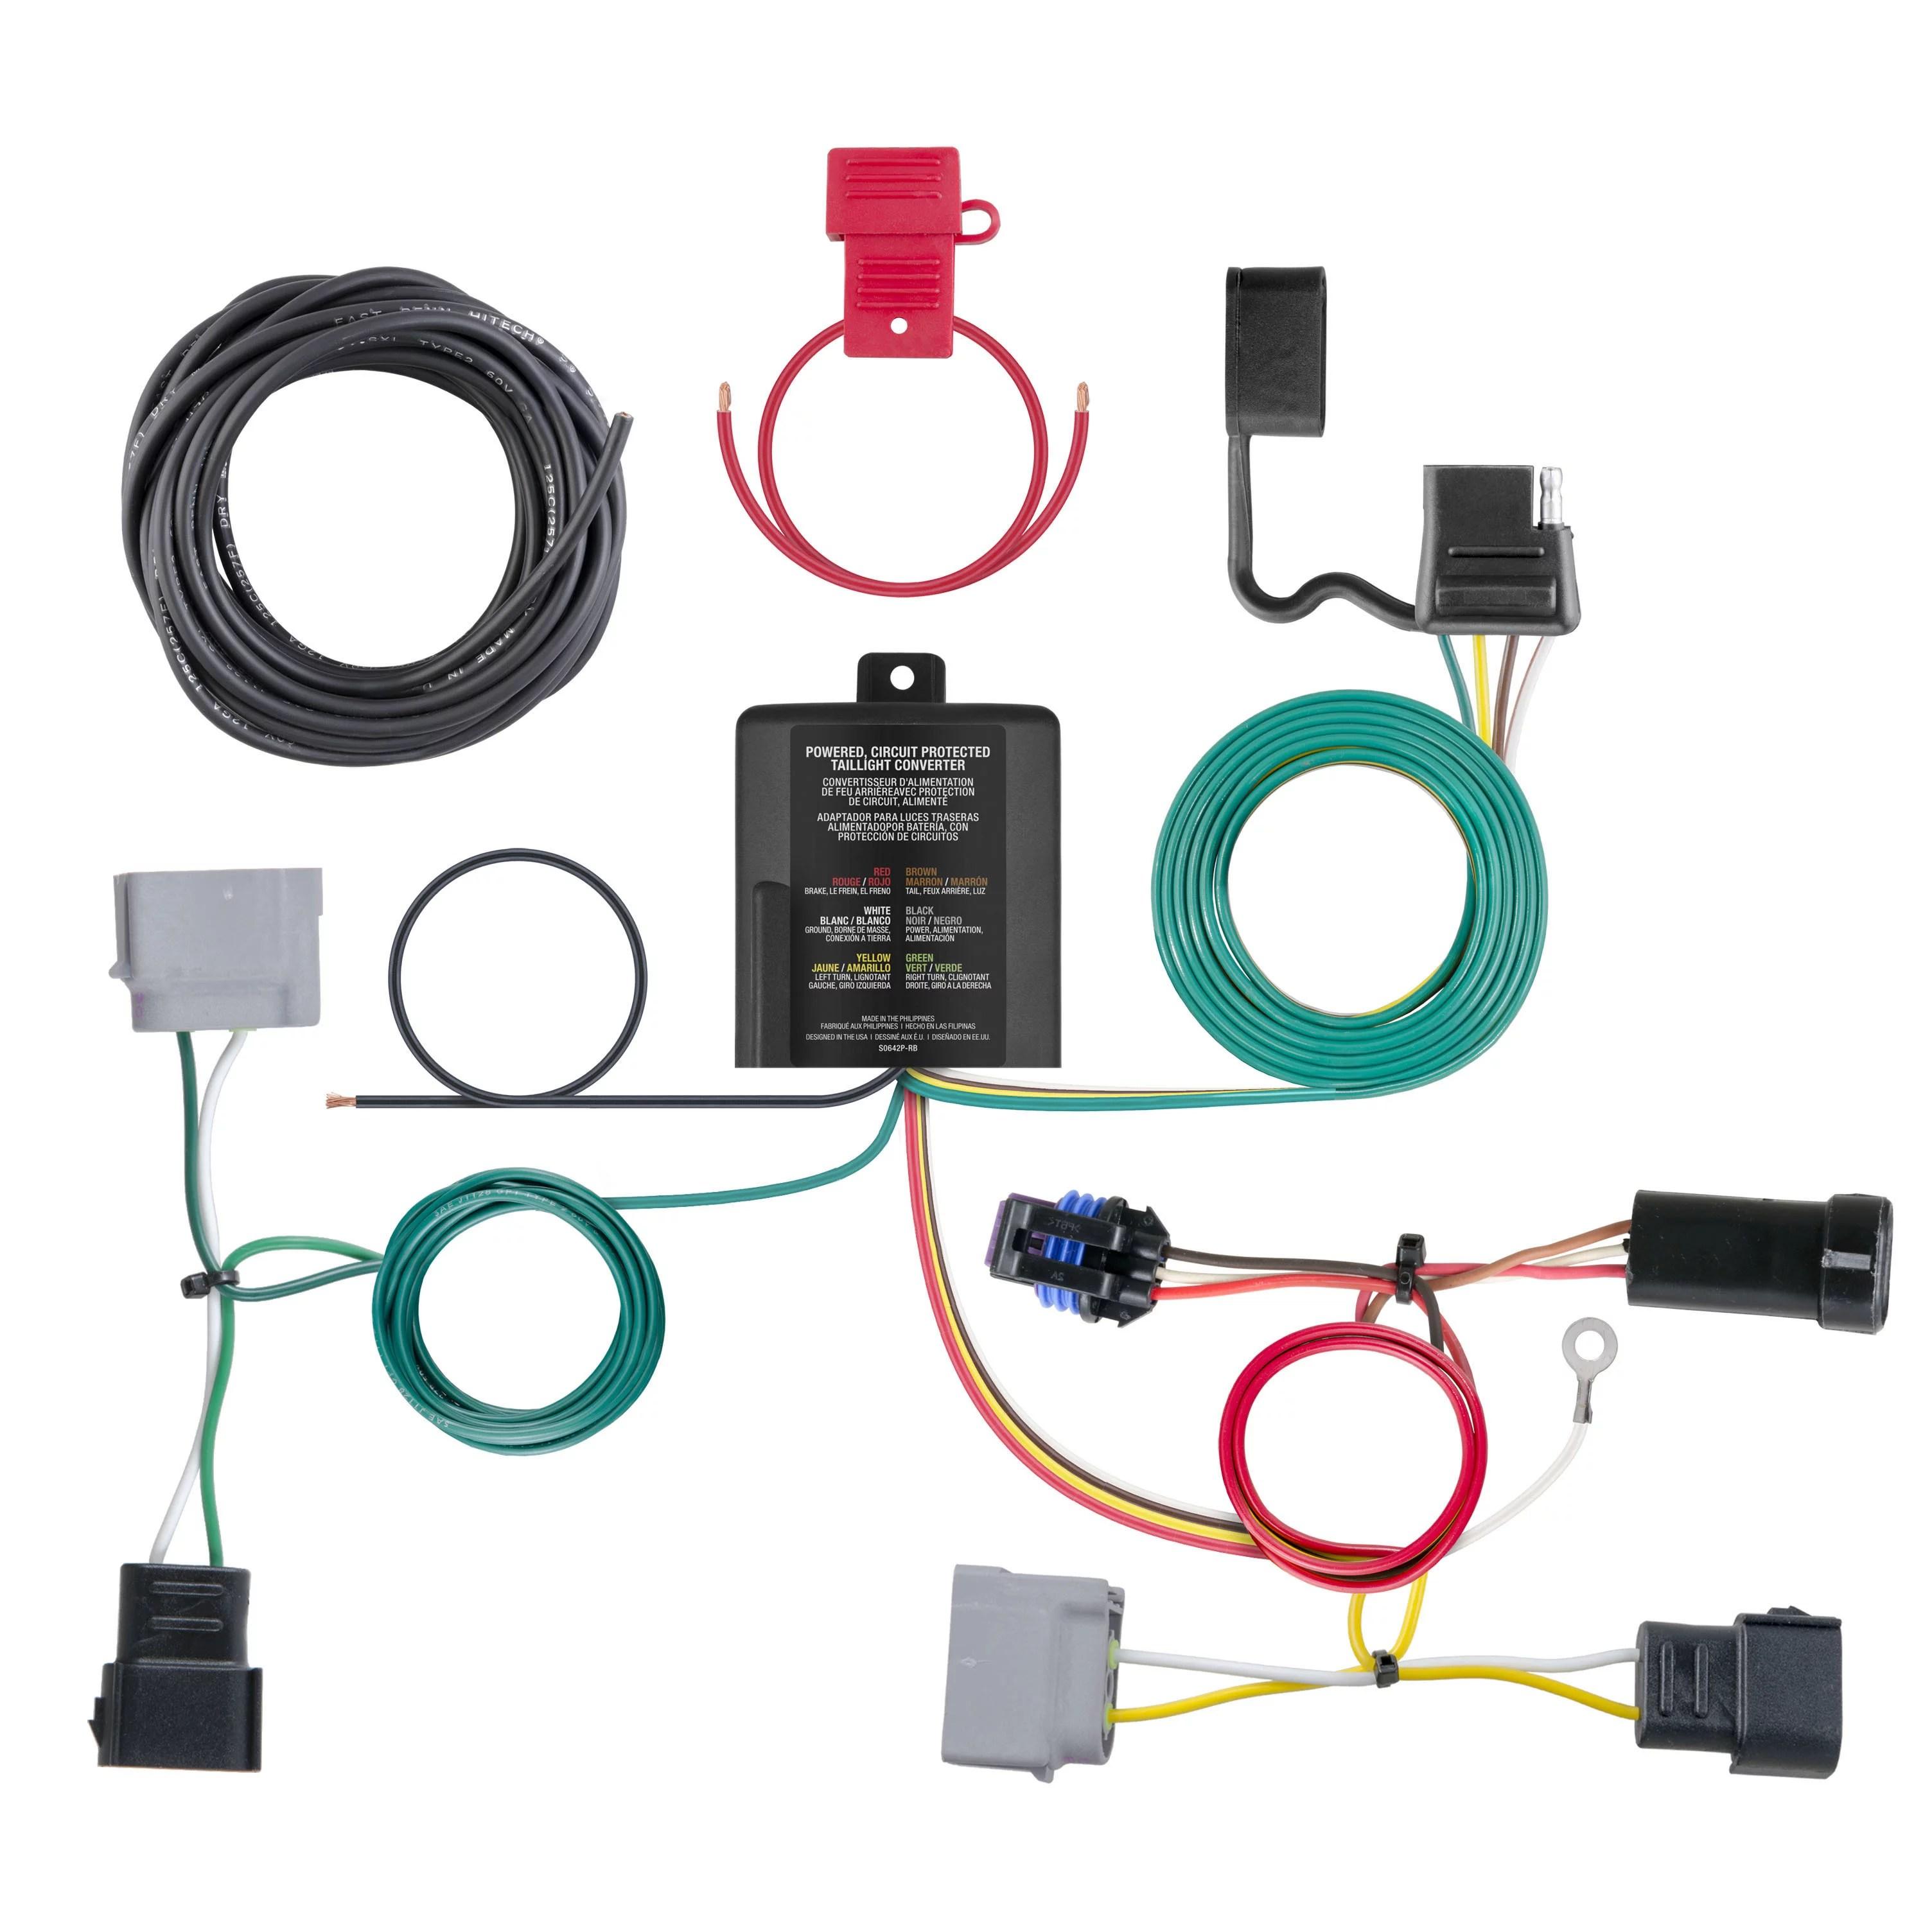 hight resolution of custom wiring harness walmart com uhaul wiring harness custom wiring harness